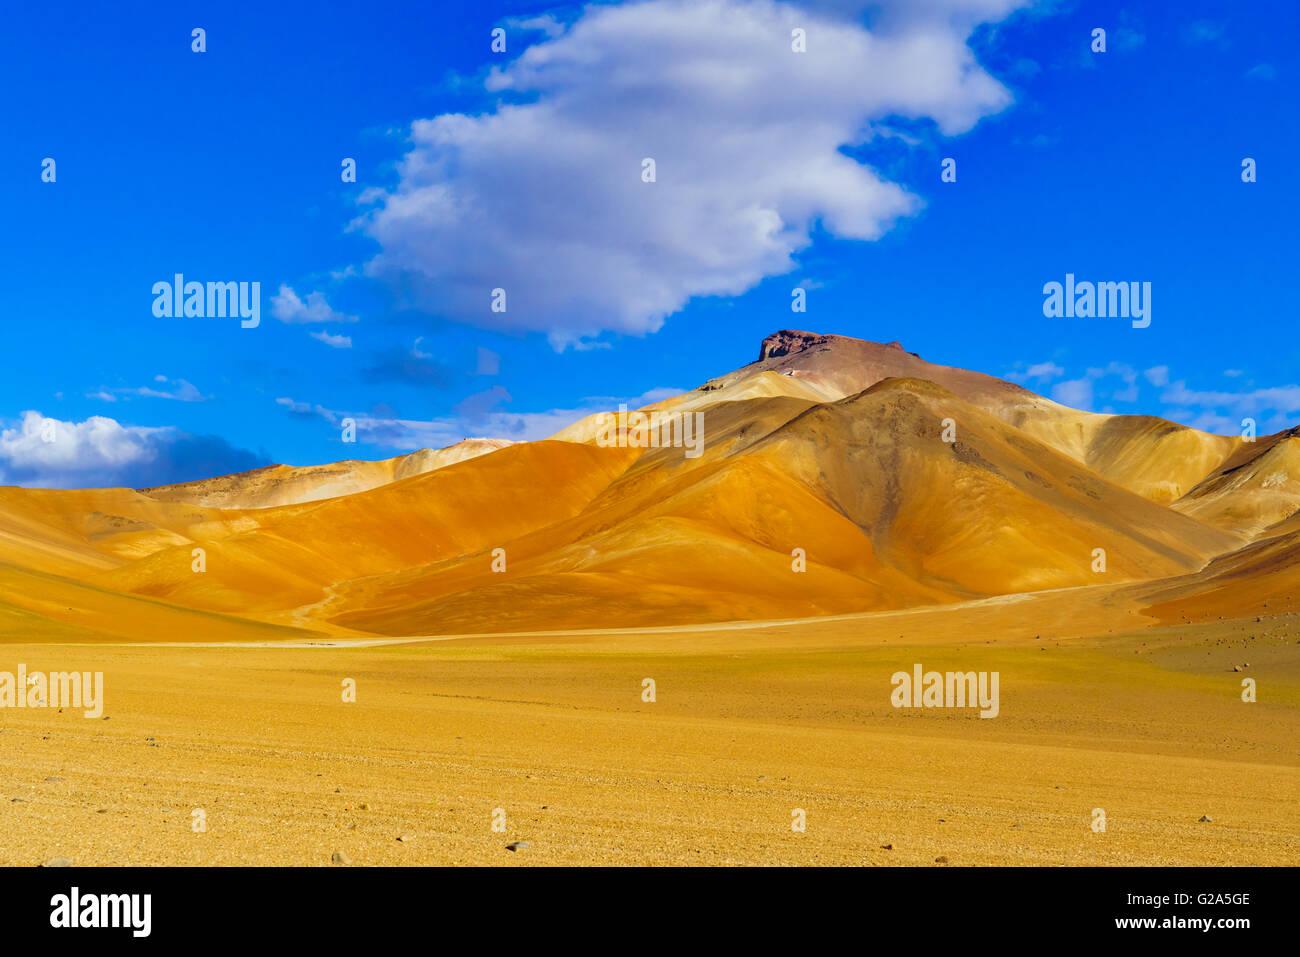 View of colorful mountain and desert in Reserva Nacional De Fauna Andina Eduardo Avaroa Potasi, Bolivia - Stock Image